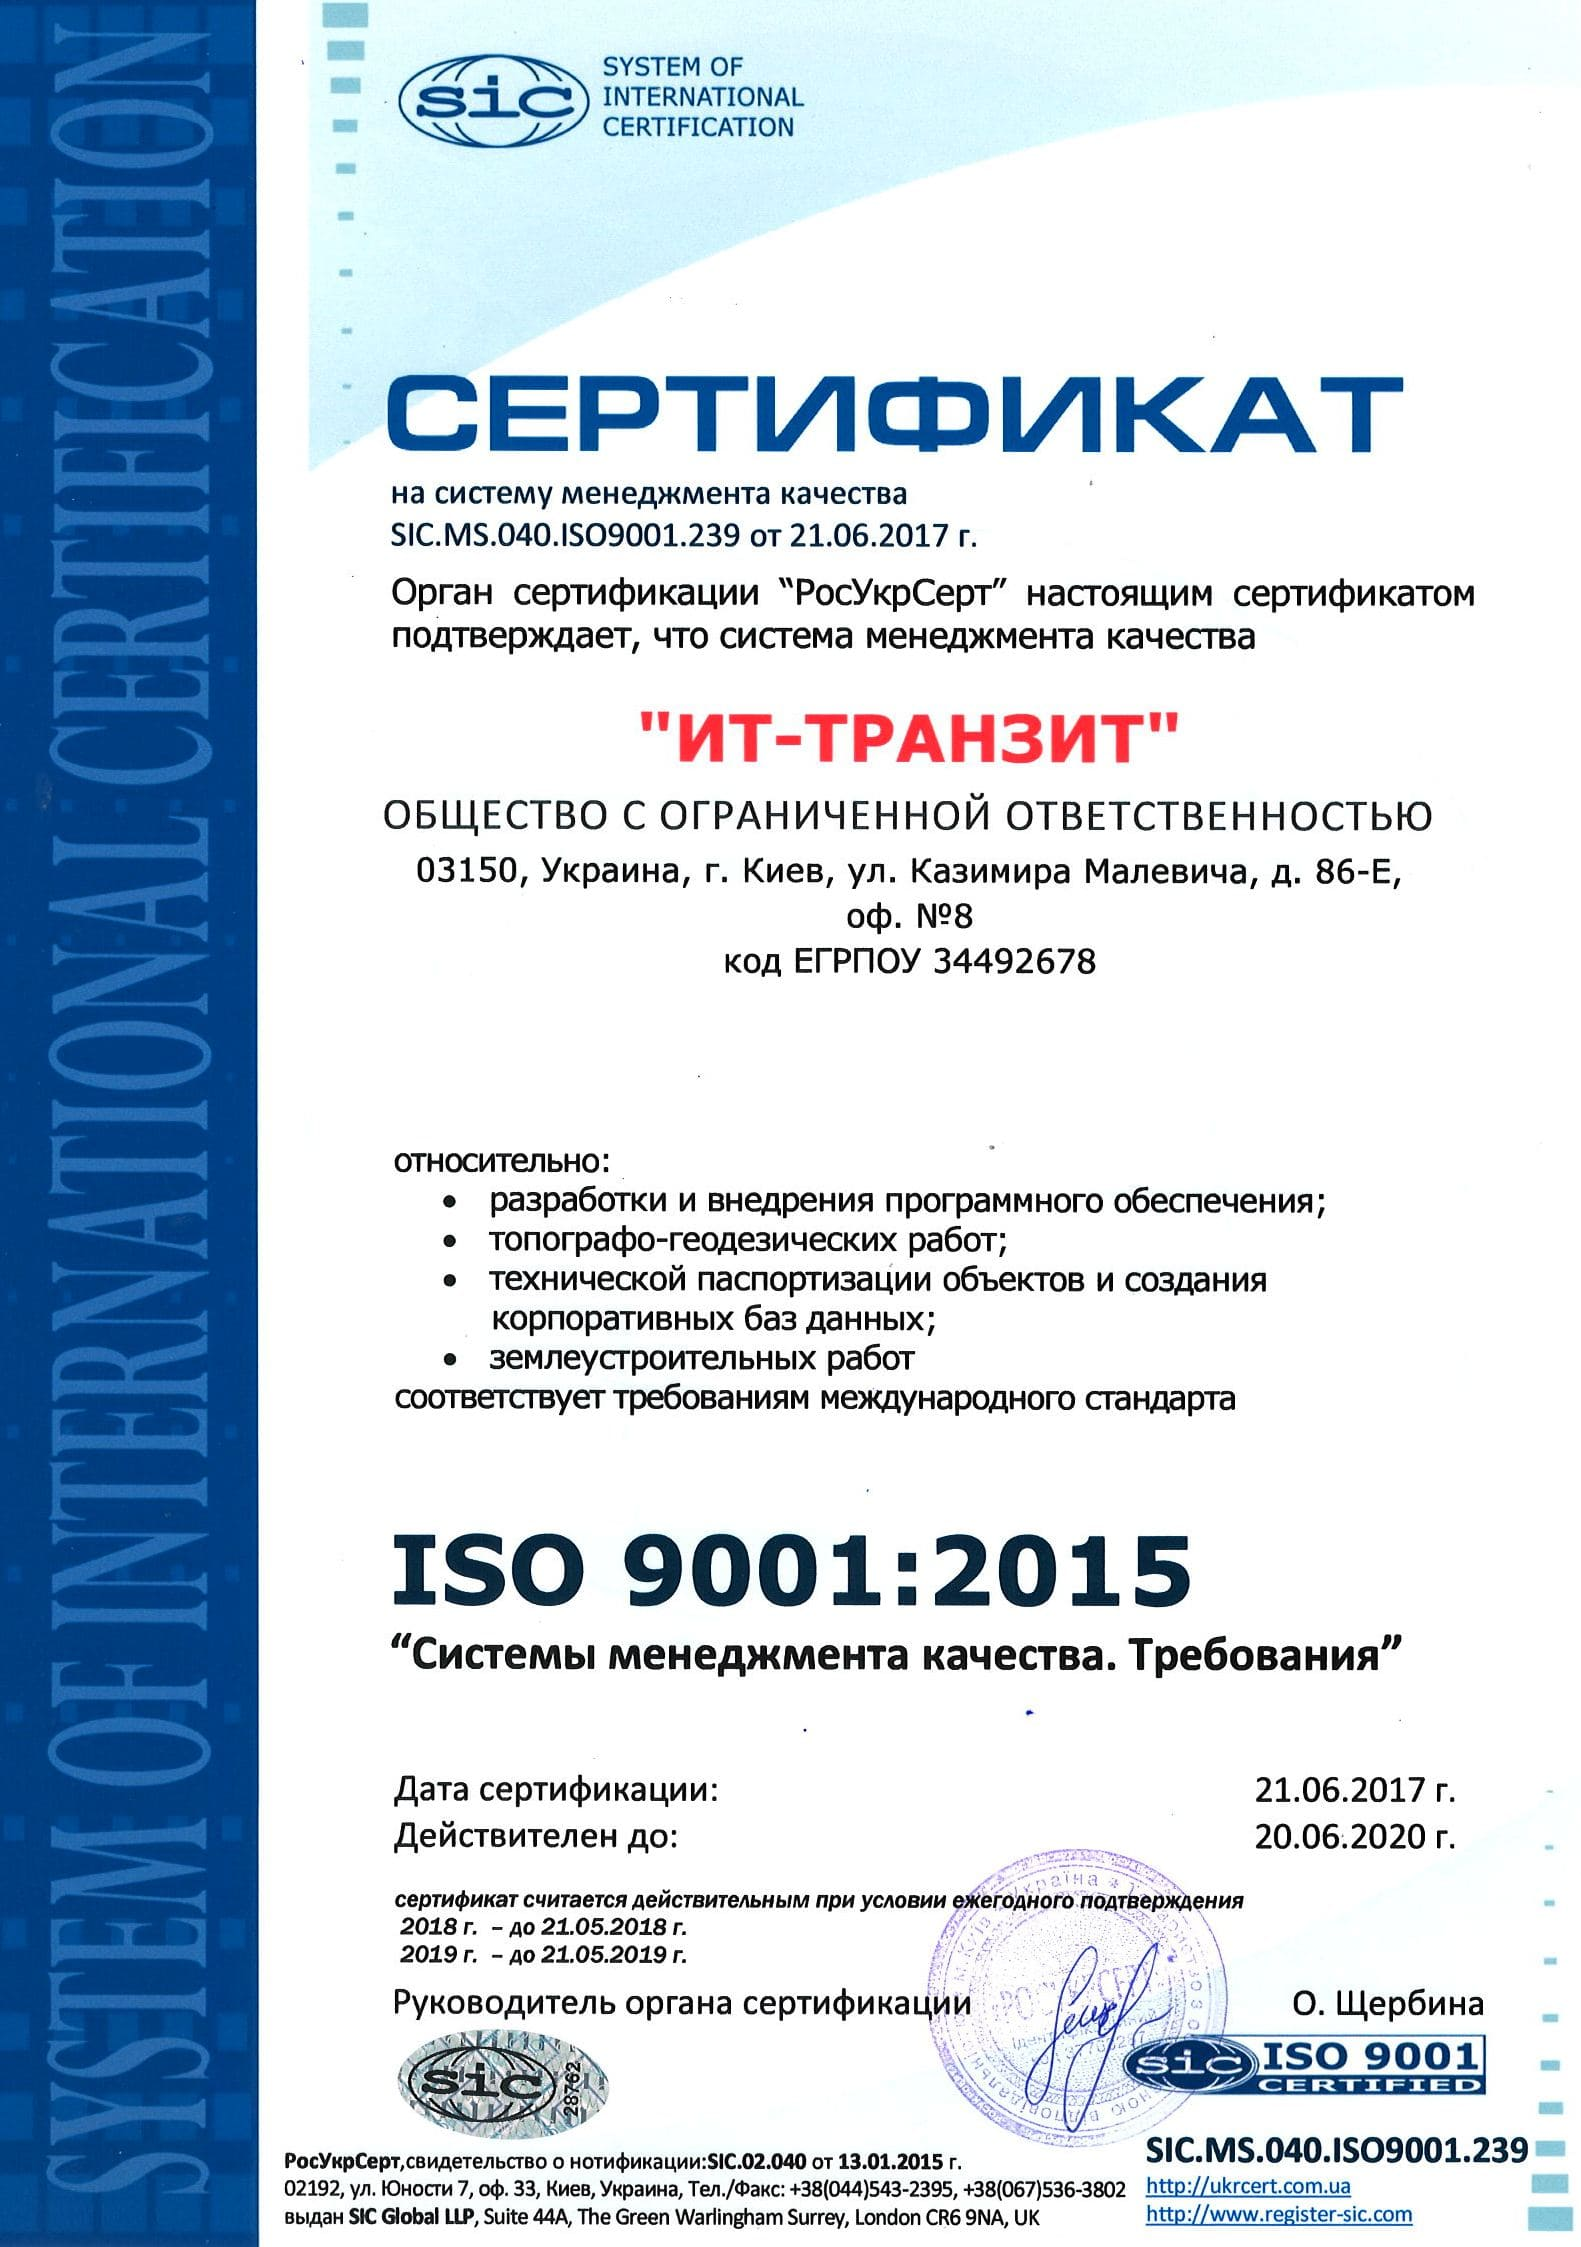 Сертификат международного стандарта ISO 9001:2015